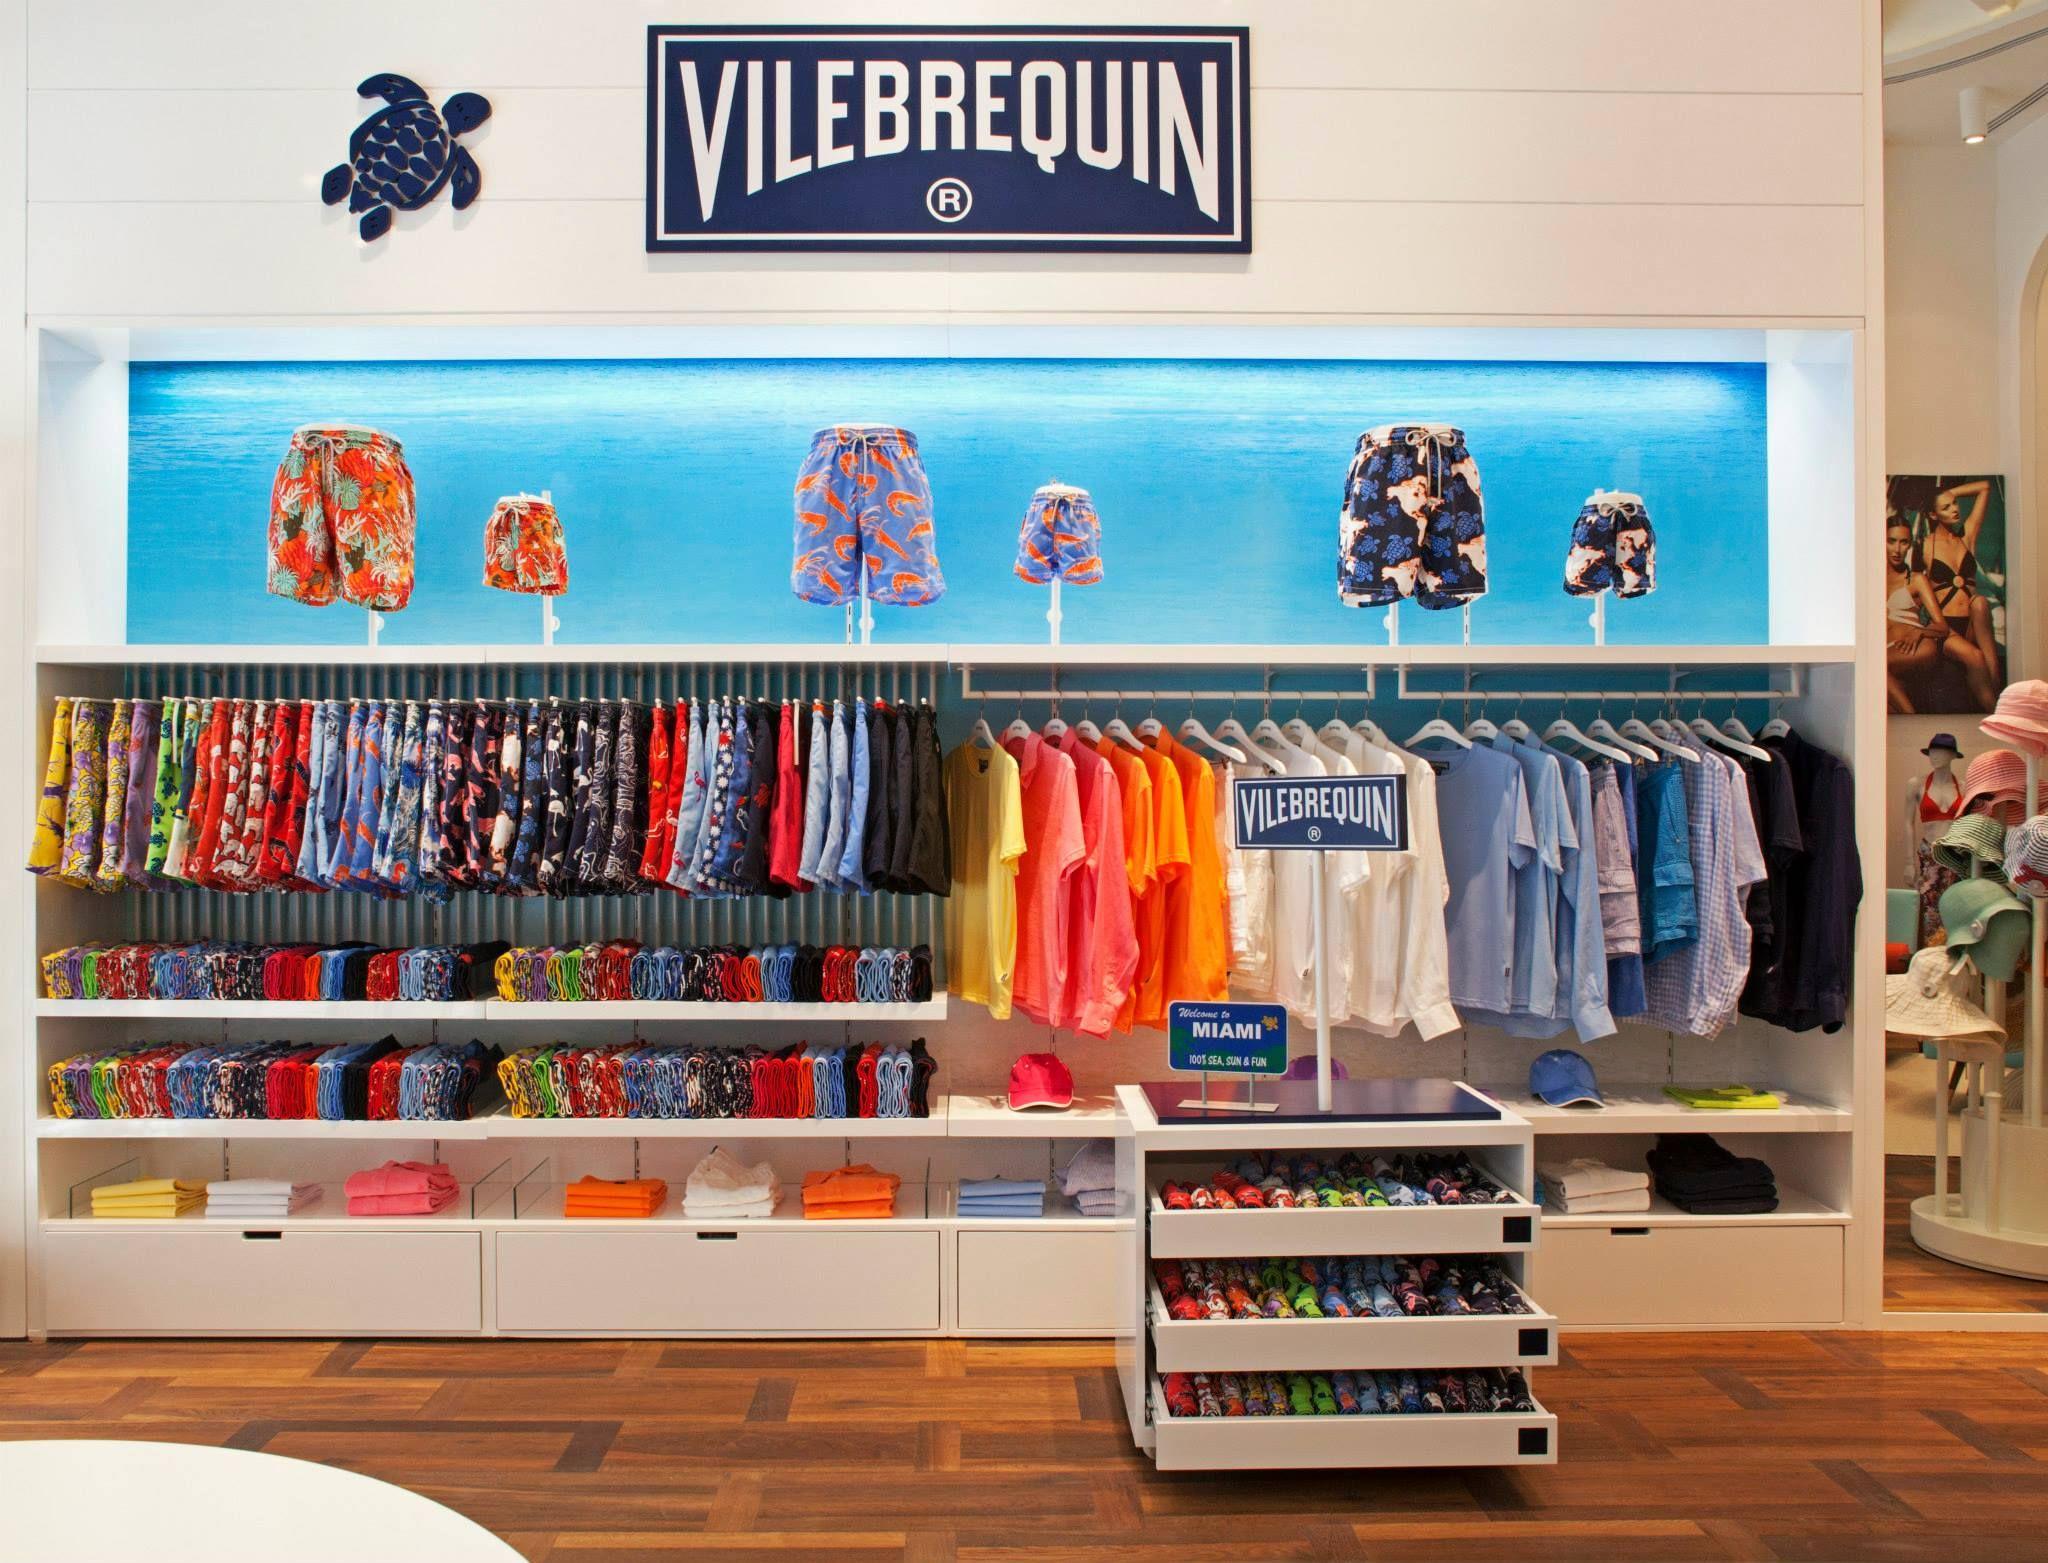 Tapis Oak Beachwear BoutiqueKährs Hamac Marronnordichomeworx l1KcFTJ3